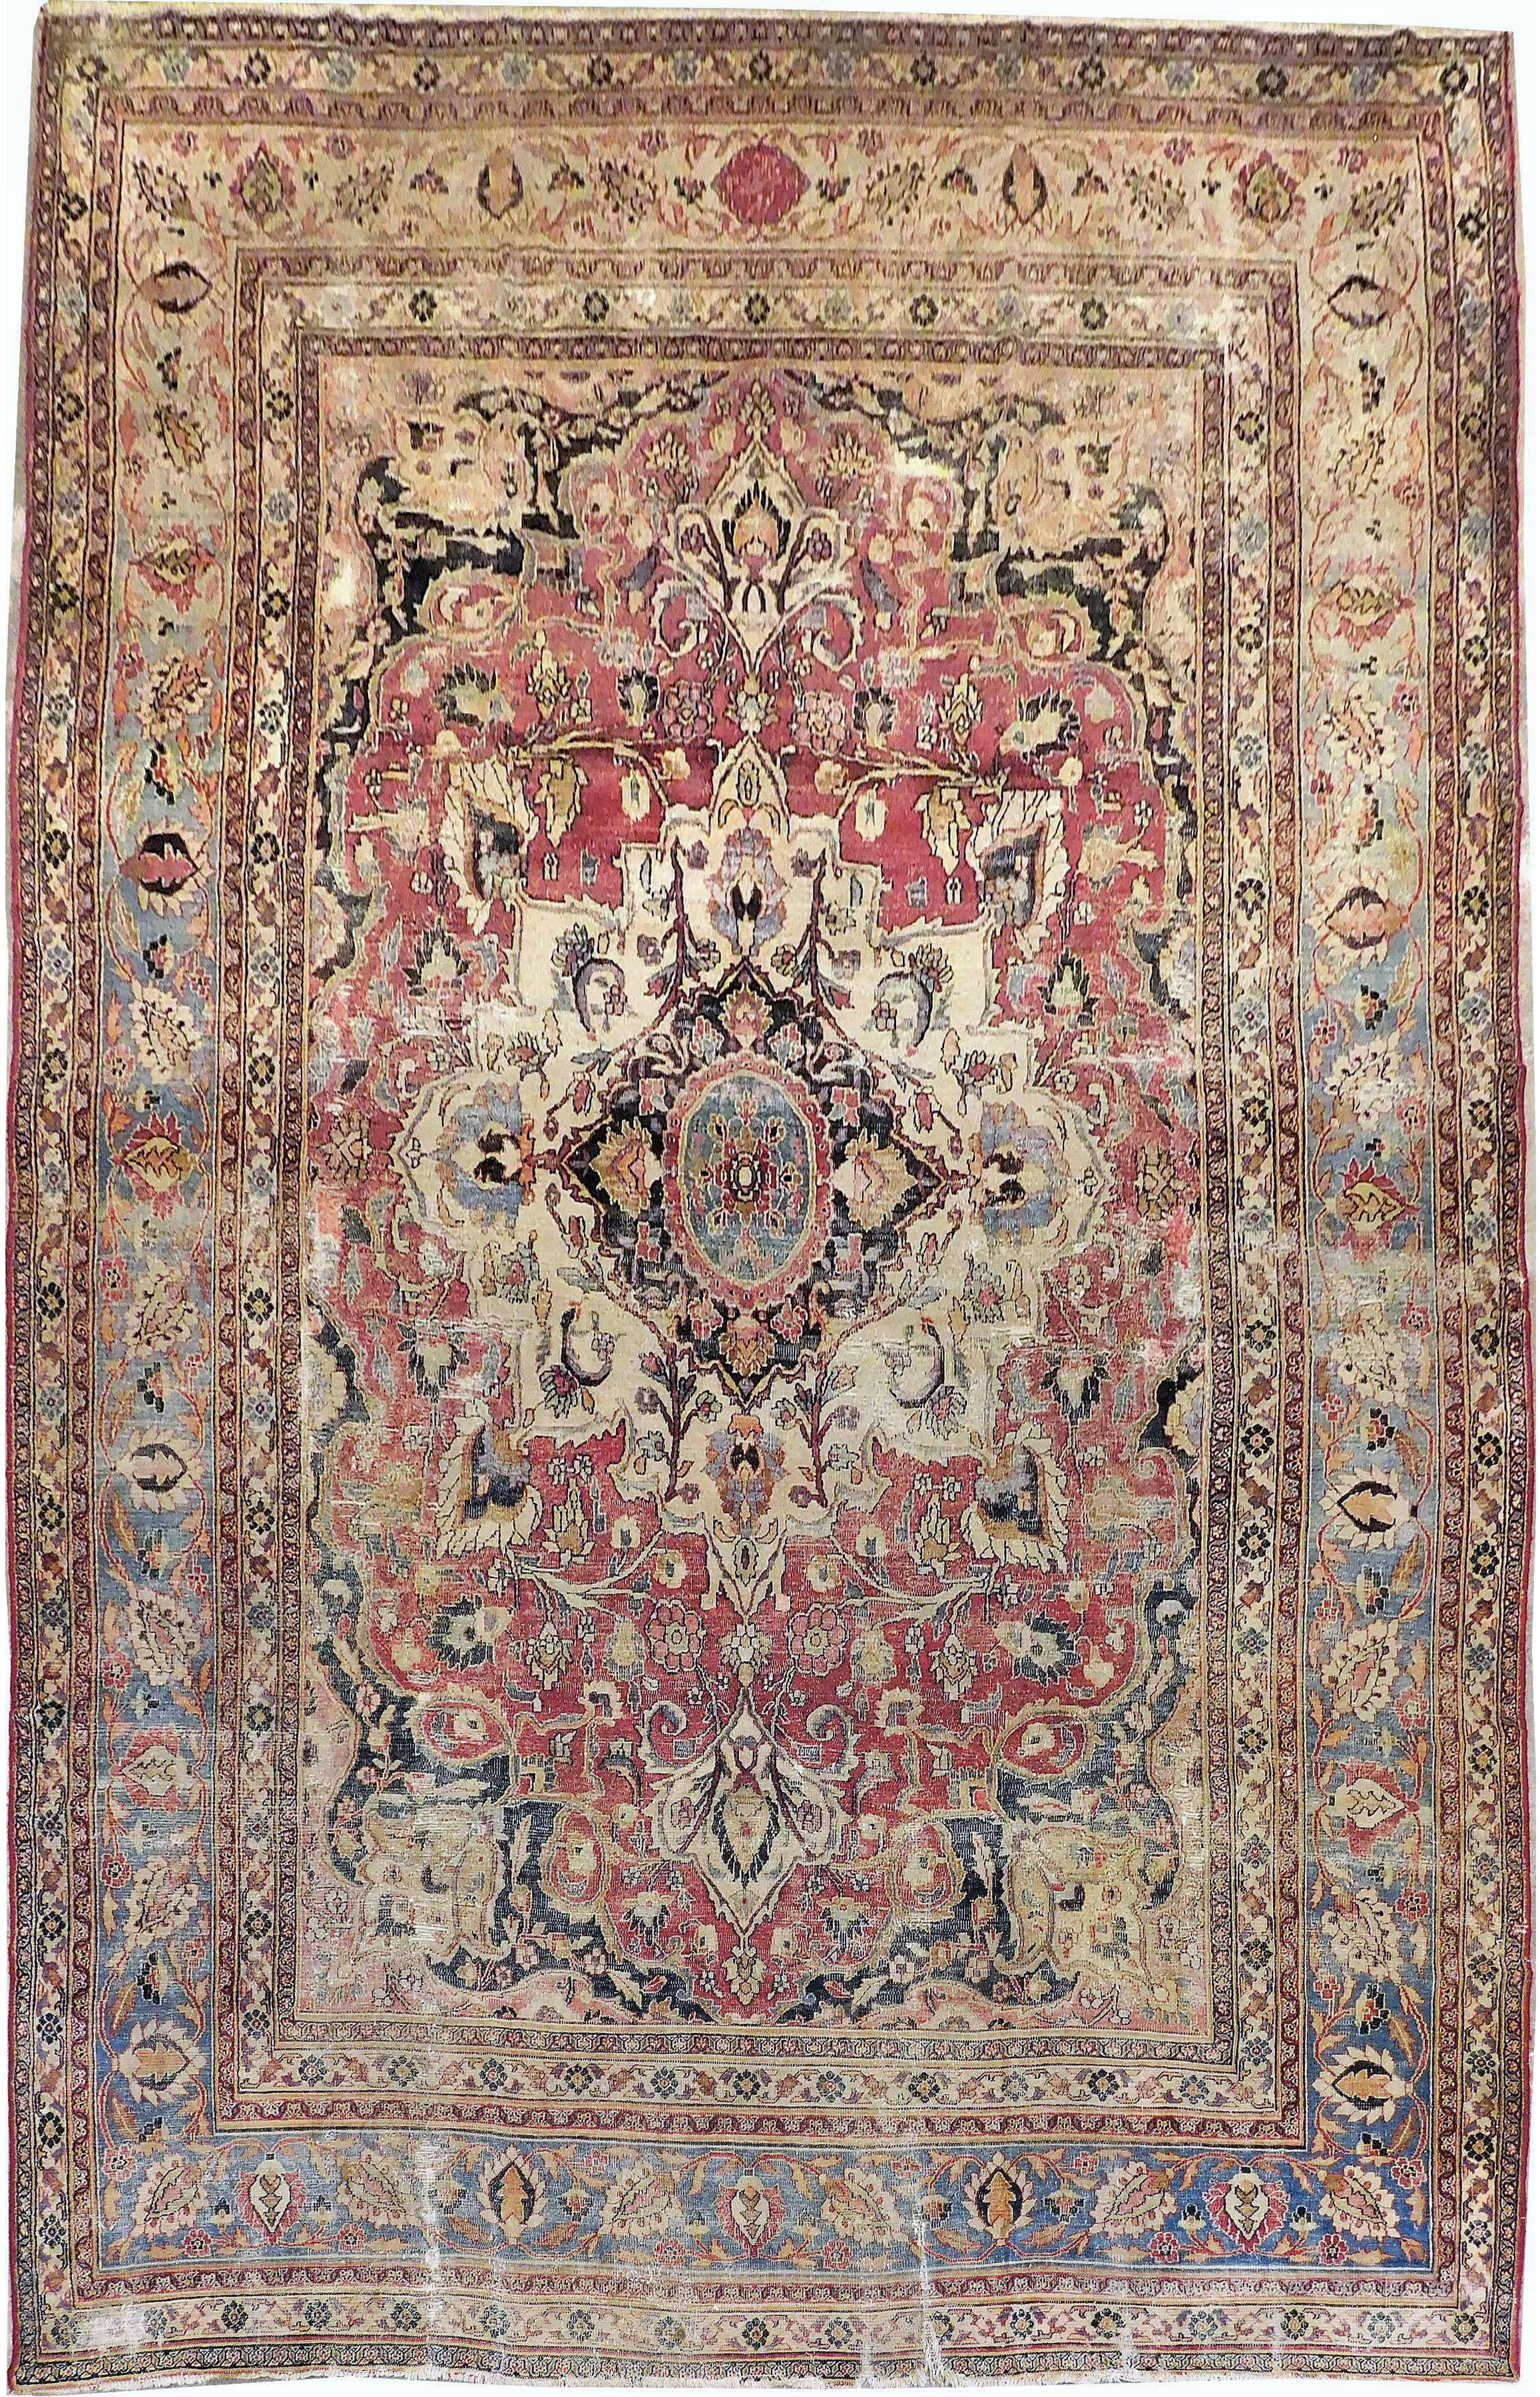 1900s Antique Persian Rug 8 4 X13 In 2020 Antique Persian Rug Persian Rug Rugs